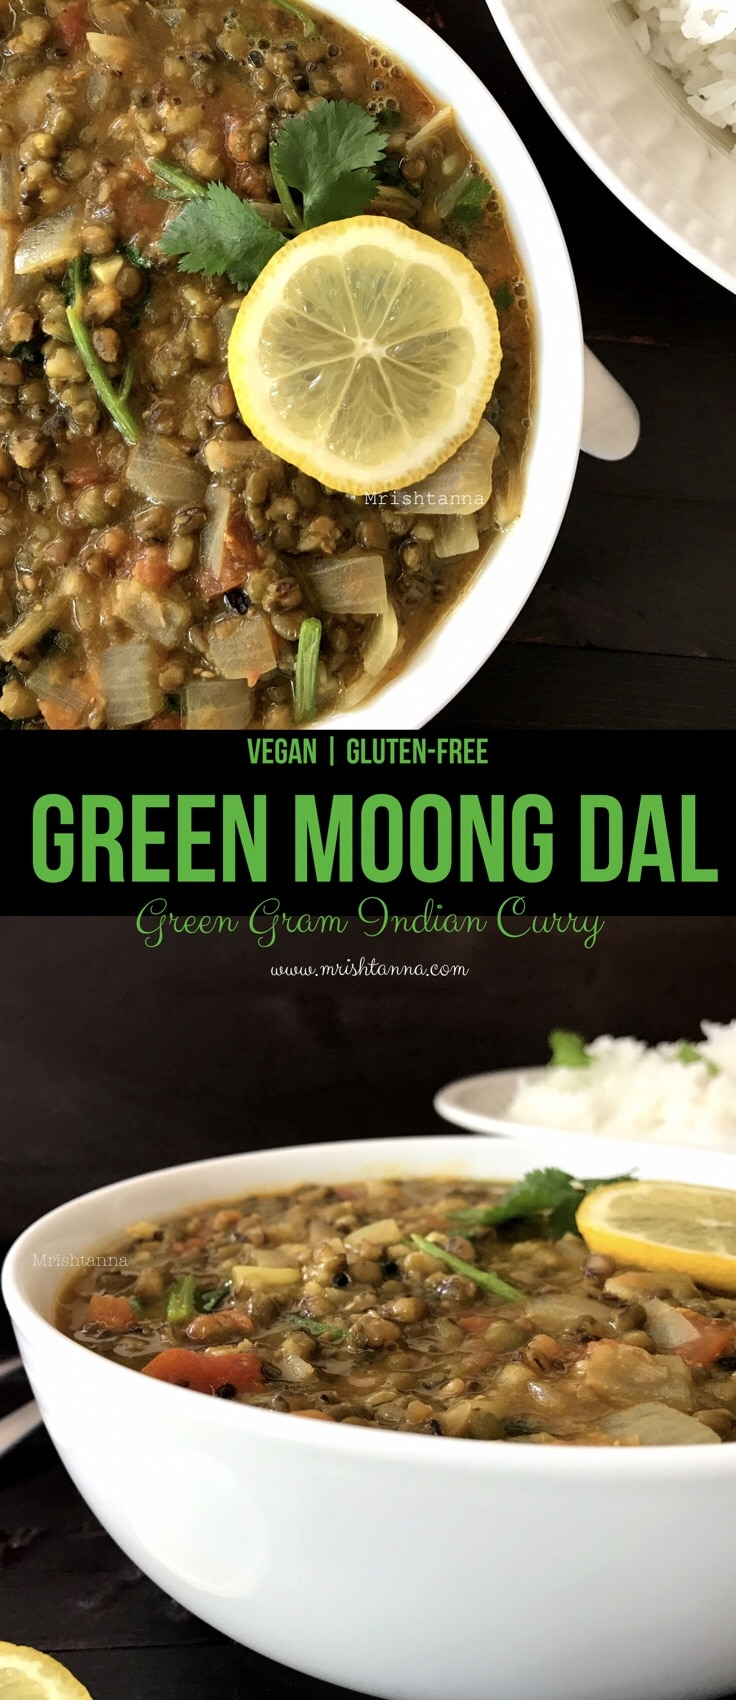 Green Moong Dal - Green Gram Dal Recipe